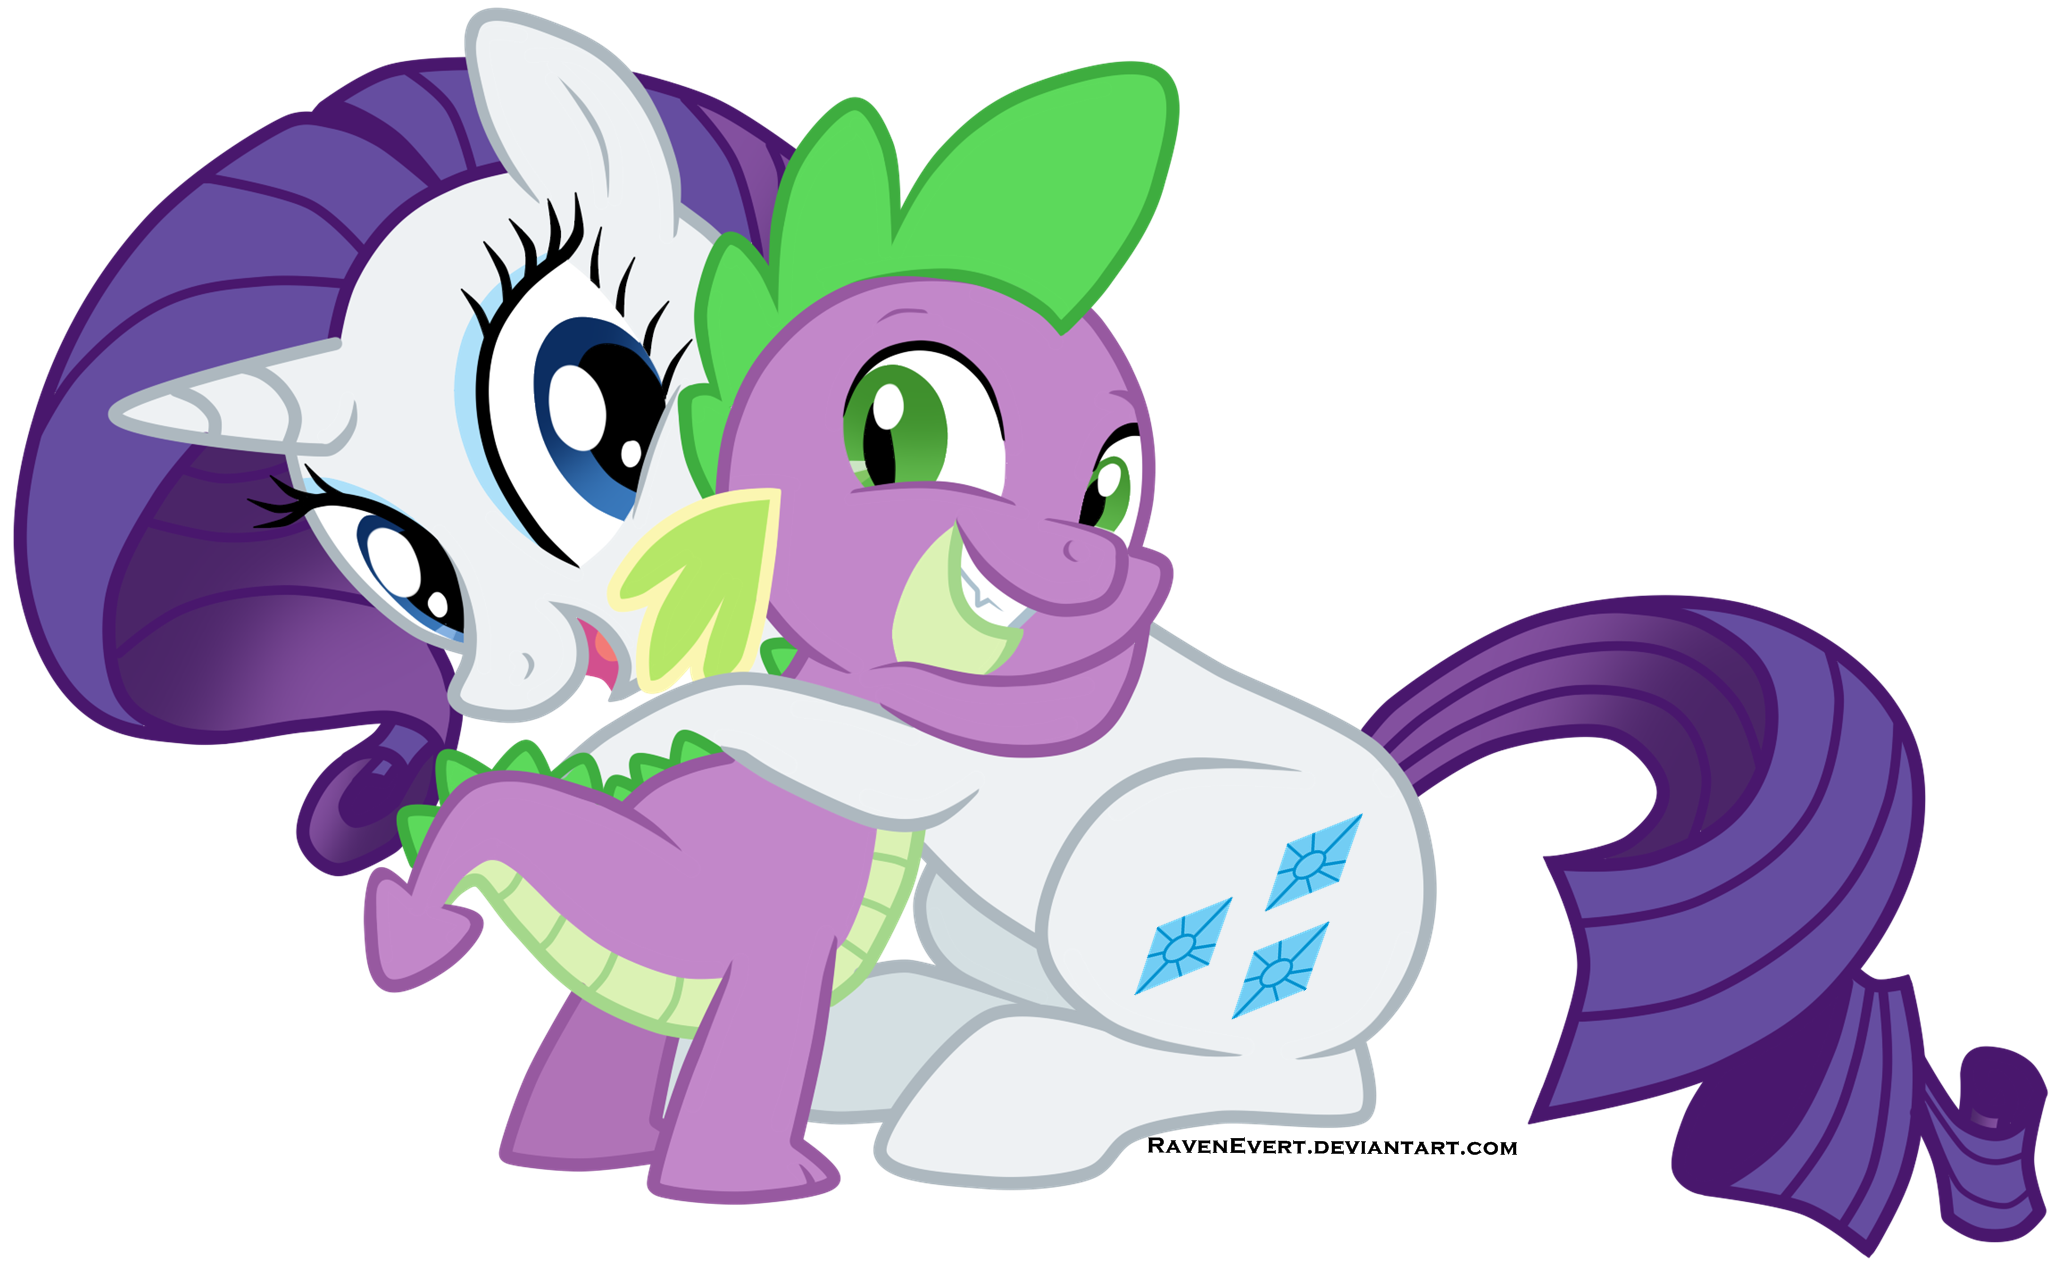 Do you think Spike and Rarity make a cute couple? Poll ...